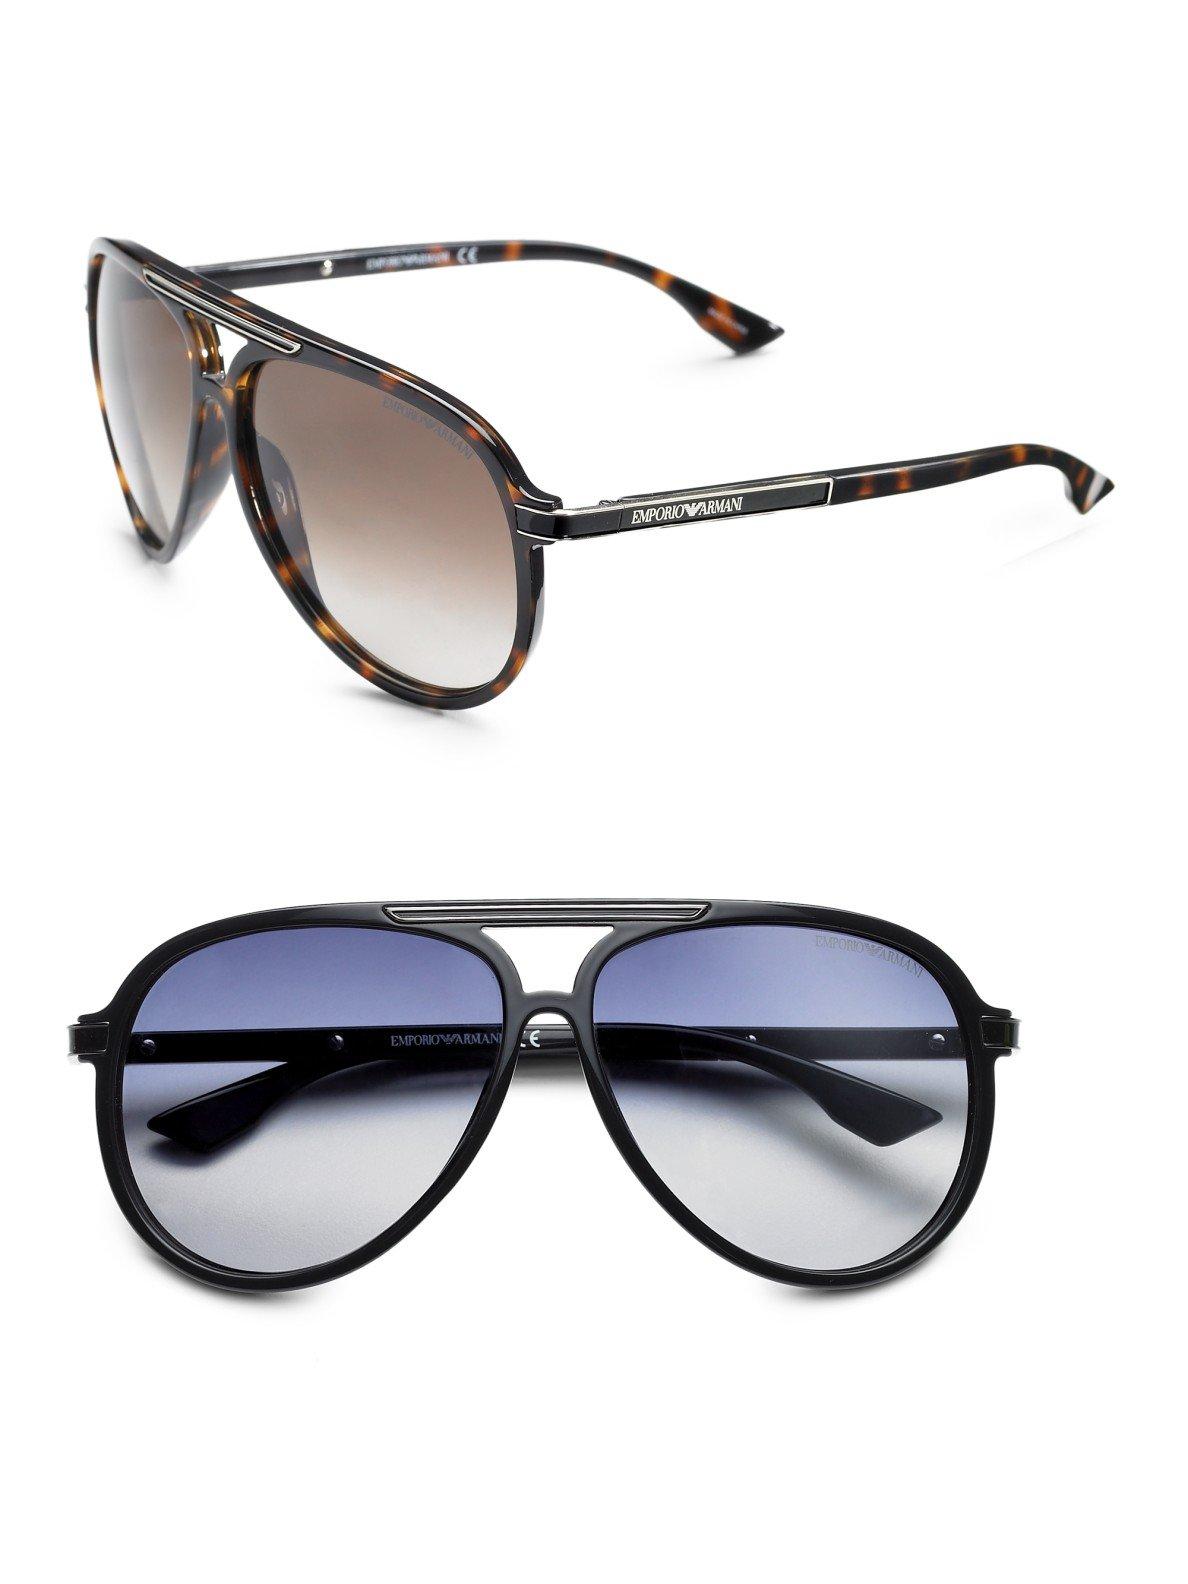 cf6dc322ef4c Emporio Armani Glasses For Men